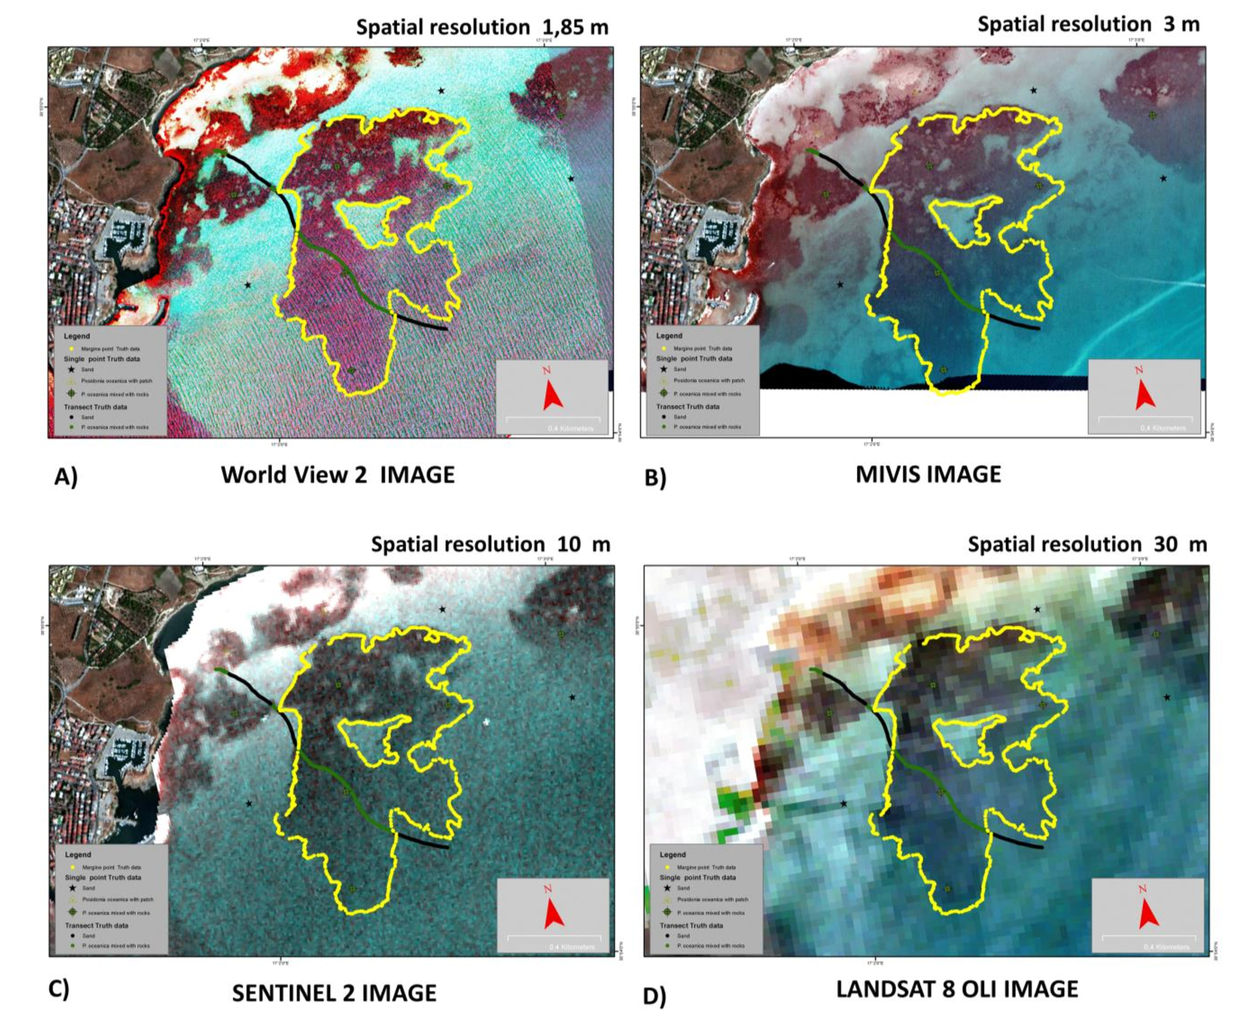 Comparison of Sentinel-2 and Landsat-8 OLI satellite images